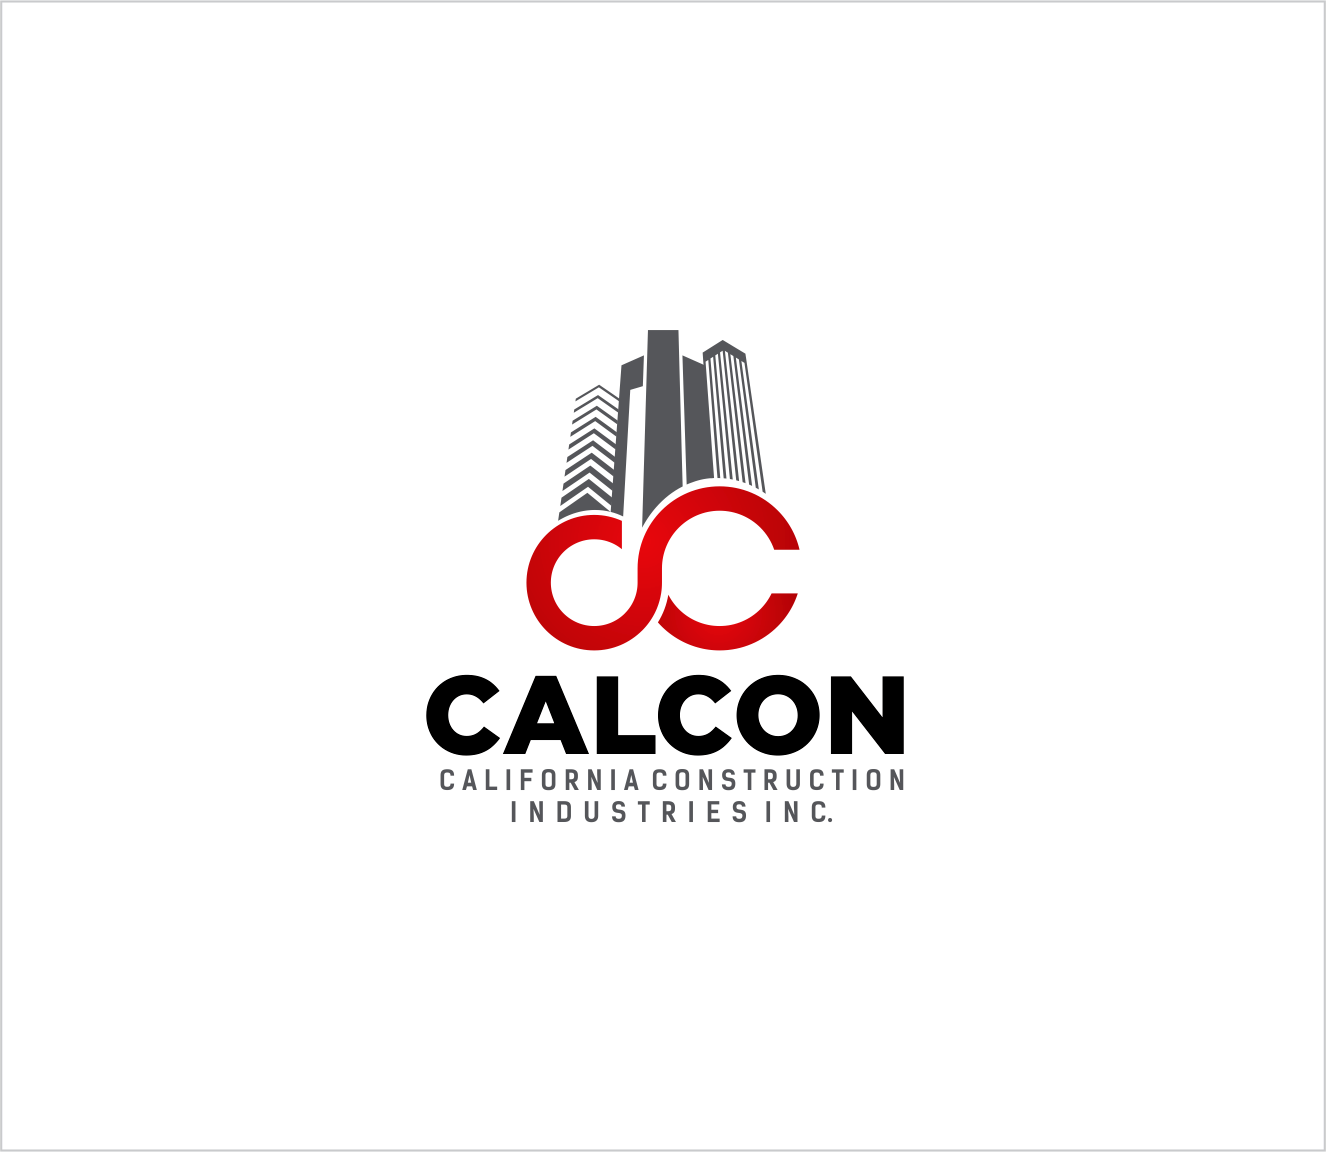 Logo Design by Armada Jamaluddin - Entry No. 30 in the Logo Design Contest California Construction Industries Inc. Logo Design.